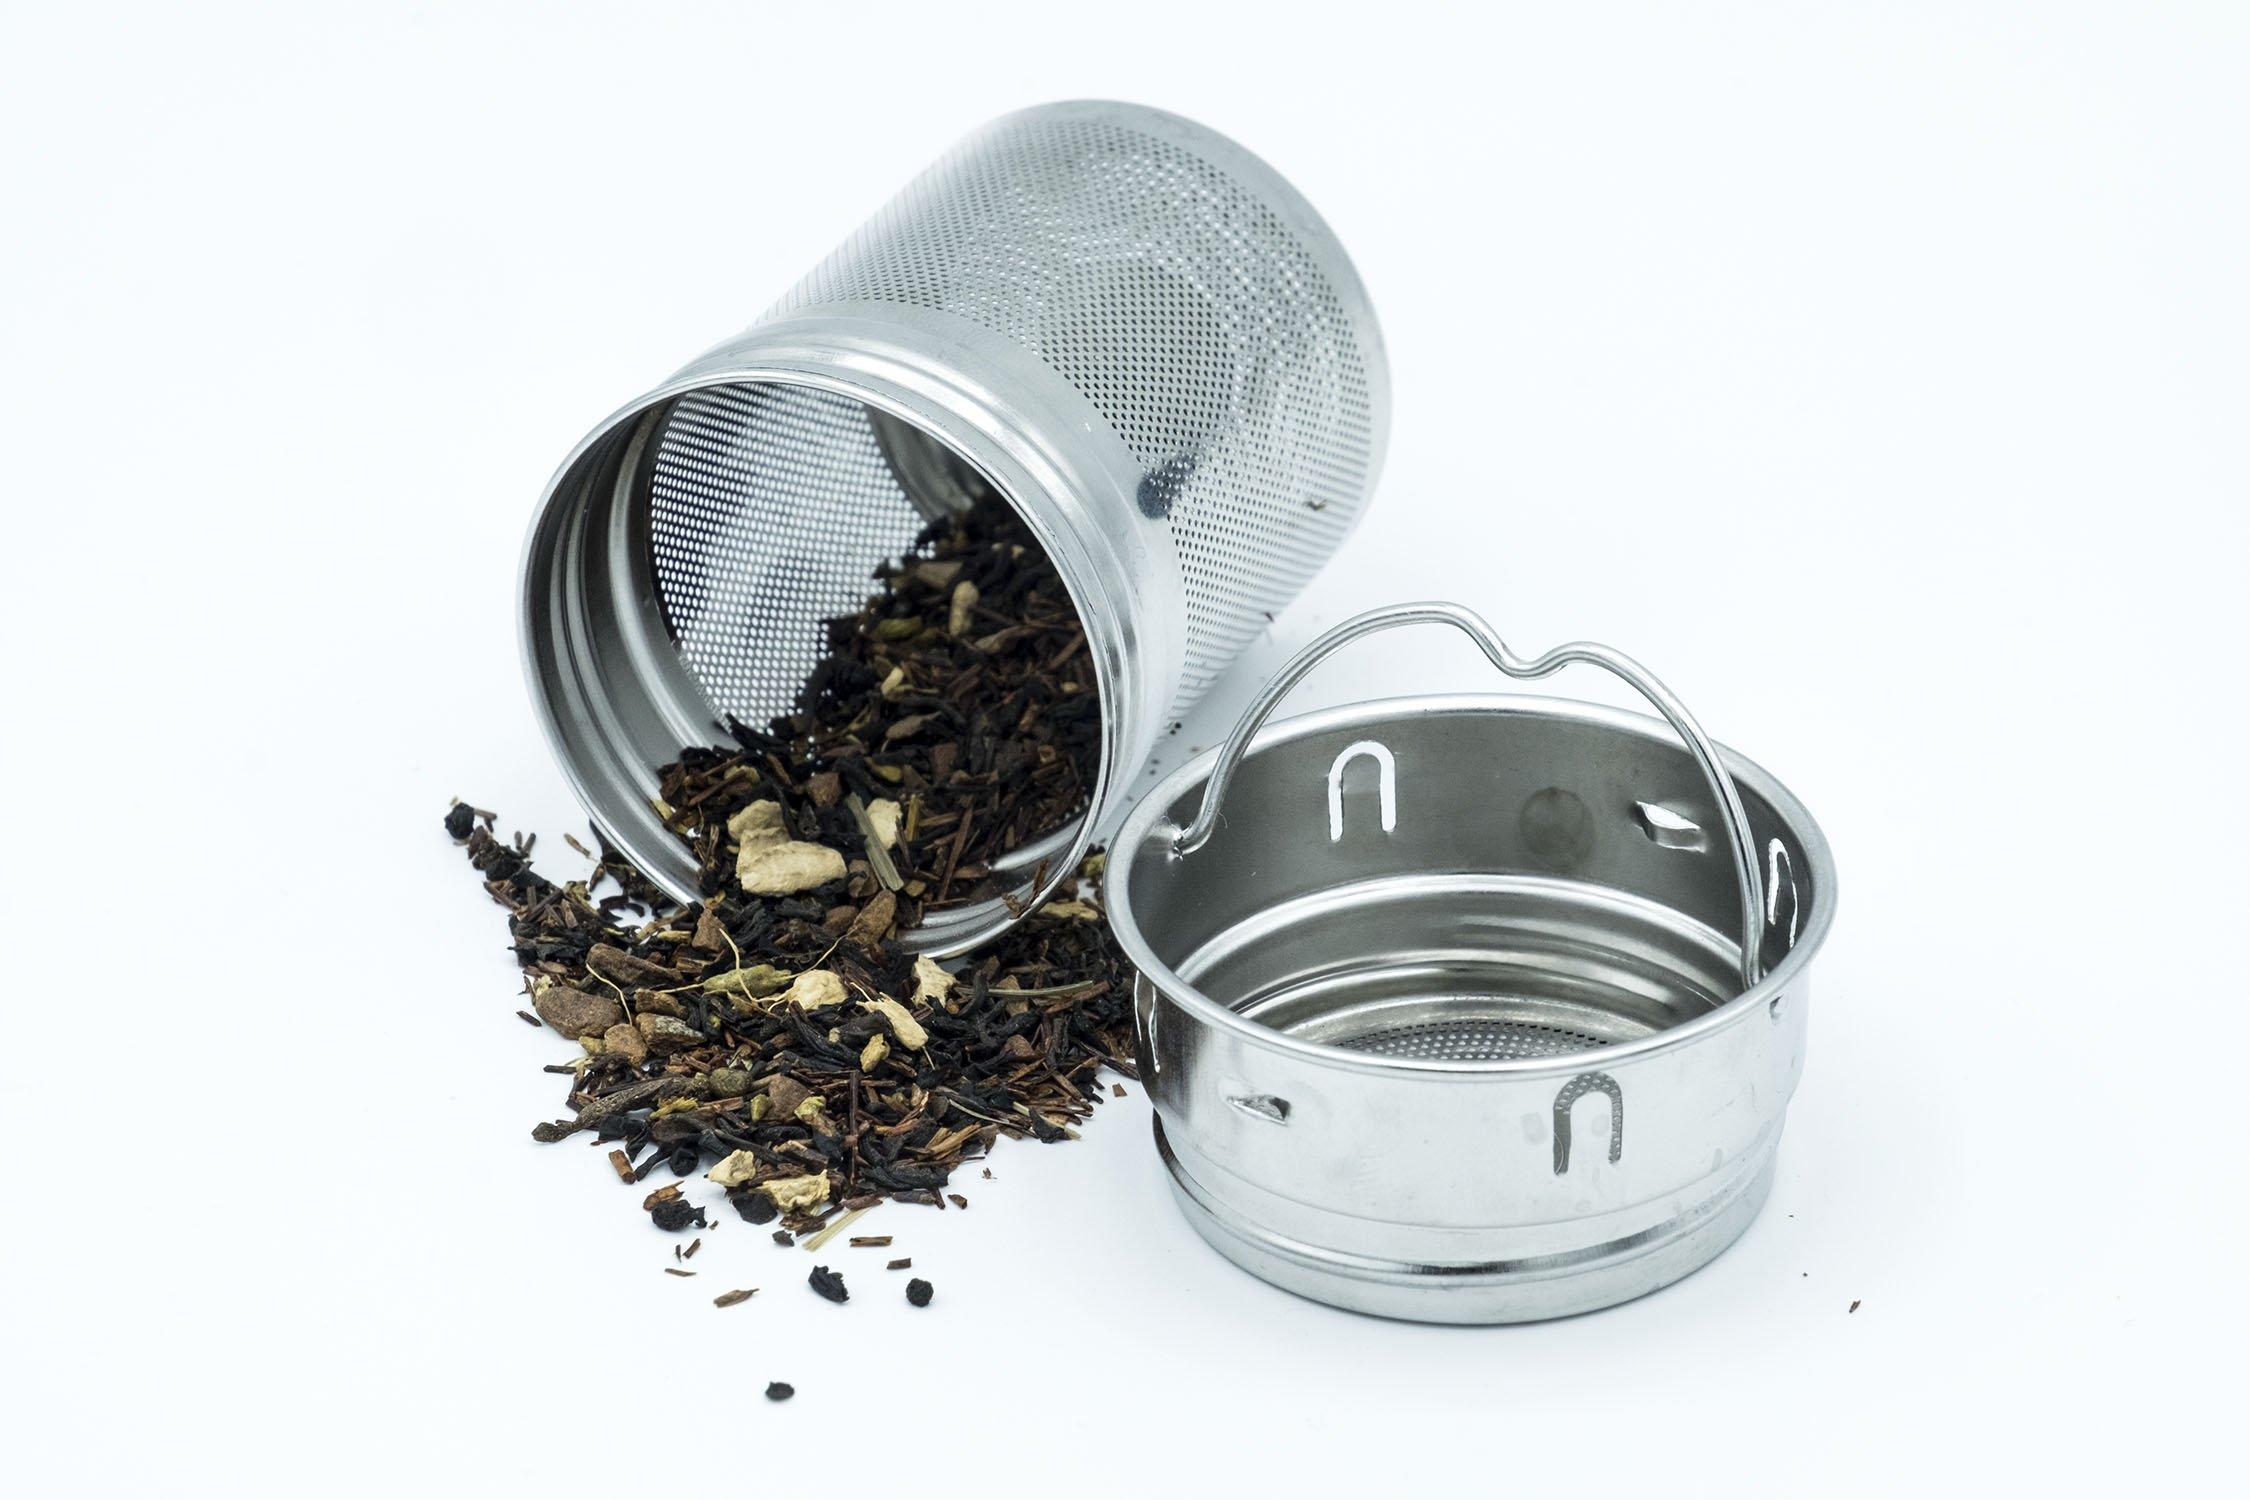 Betta Bottle Reusable Stainless Steel Tea Filter/Infuser